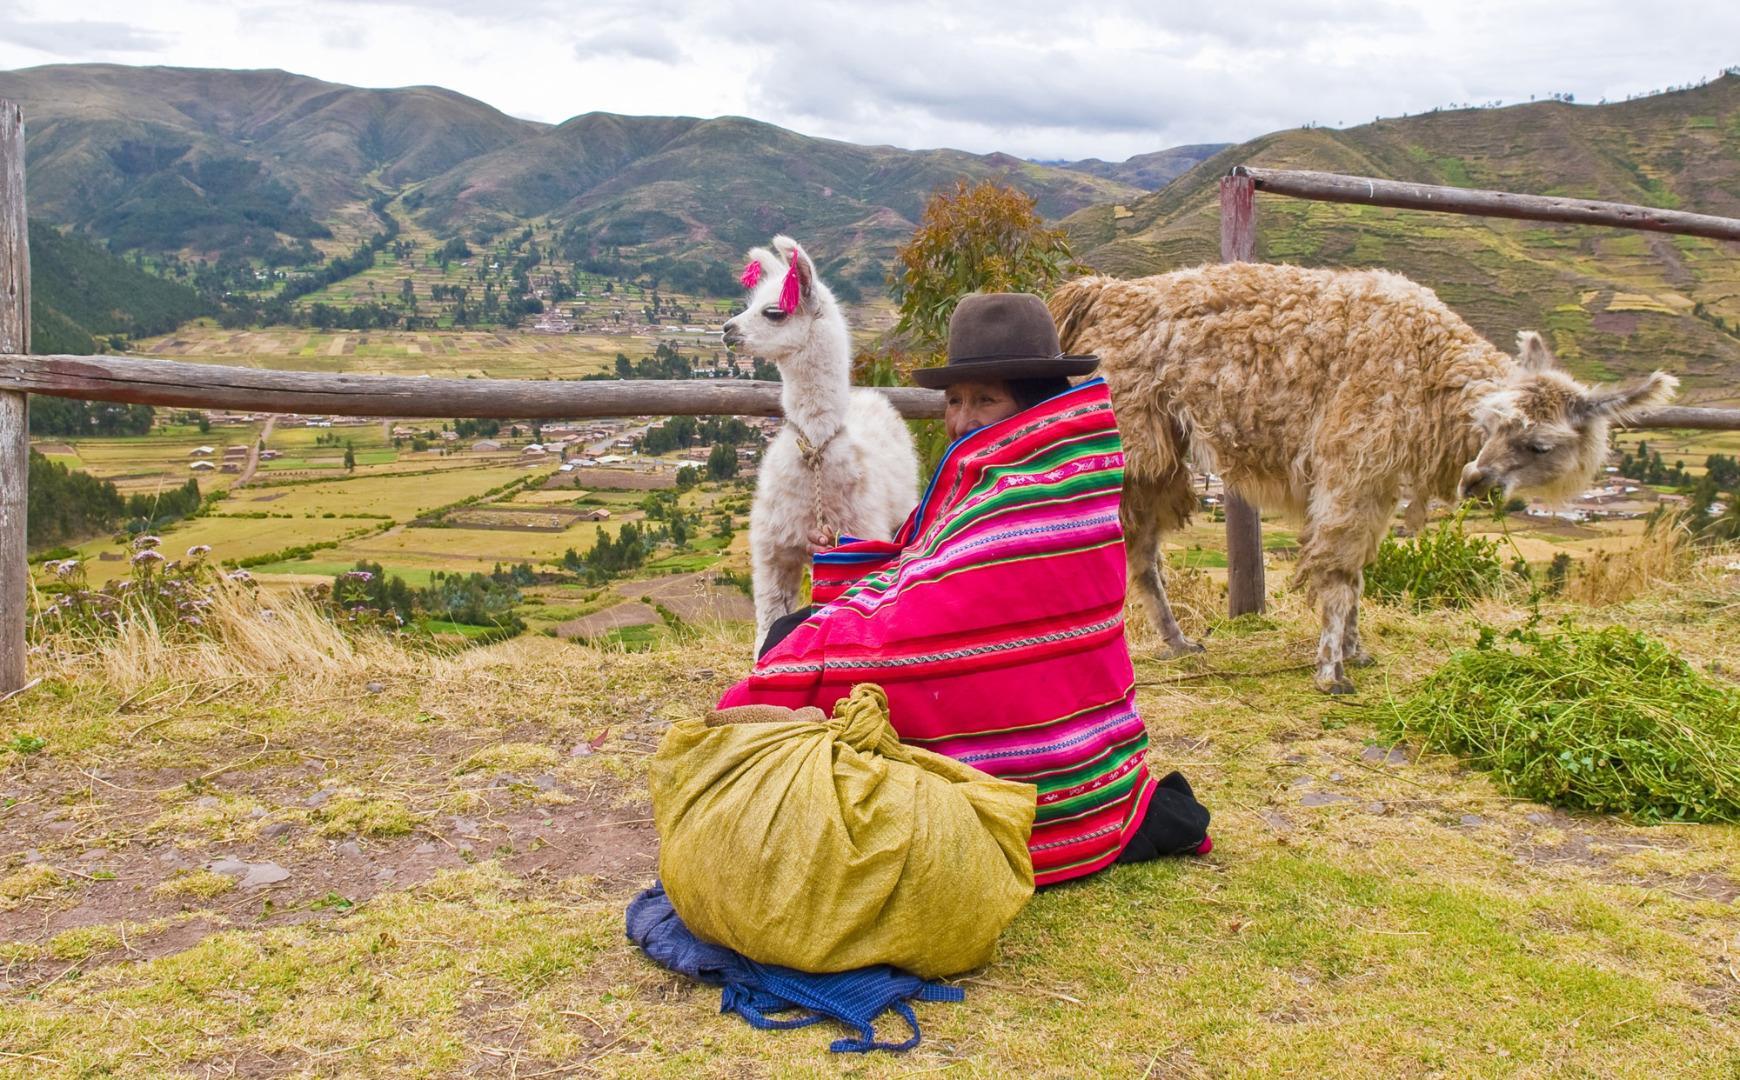 Inca Table Saw Wiring Diagram Simple Schematic Lathe Fregoth Highlights Of Peru Tour Grand European Travel Delta